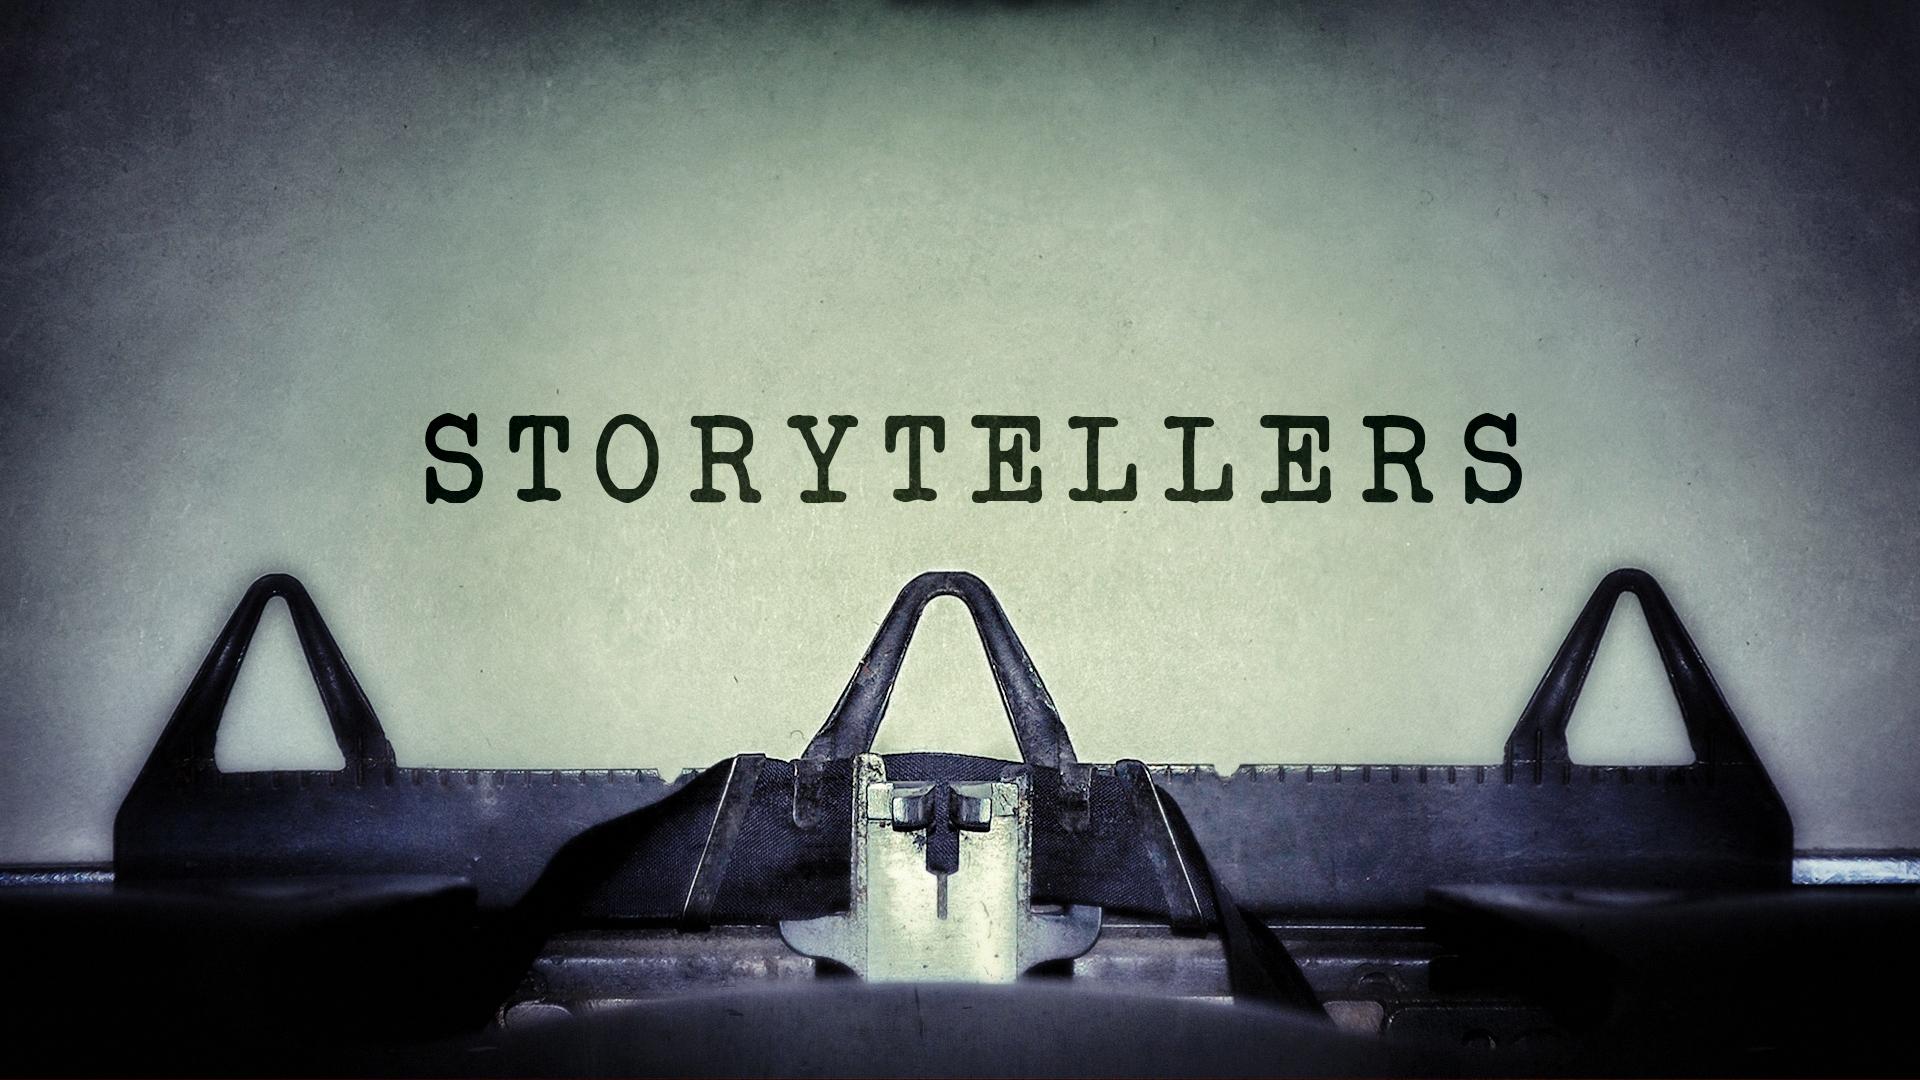 STORYTELLERS - A film has three directors